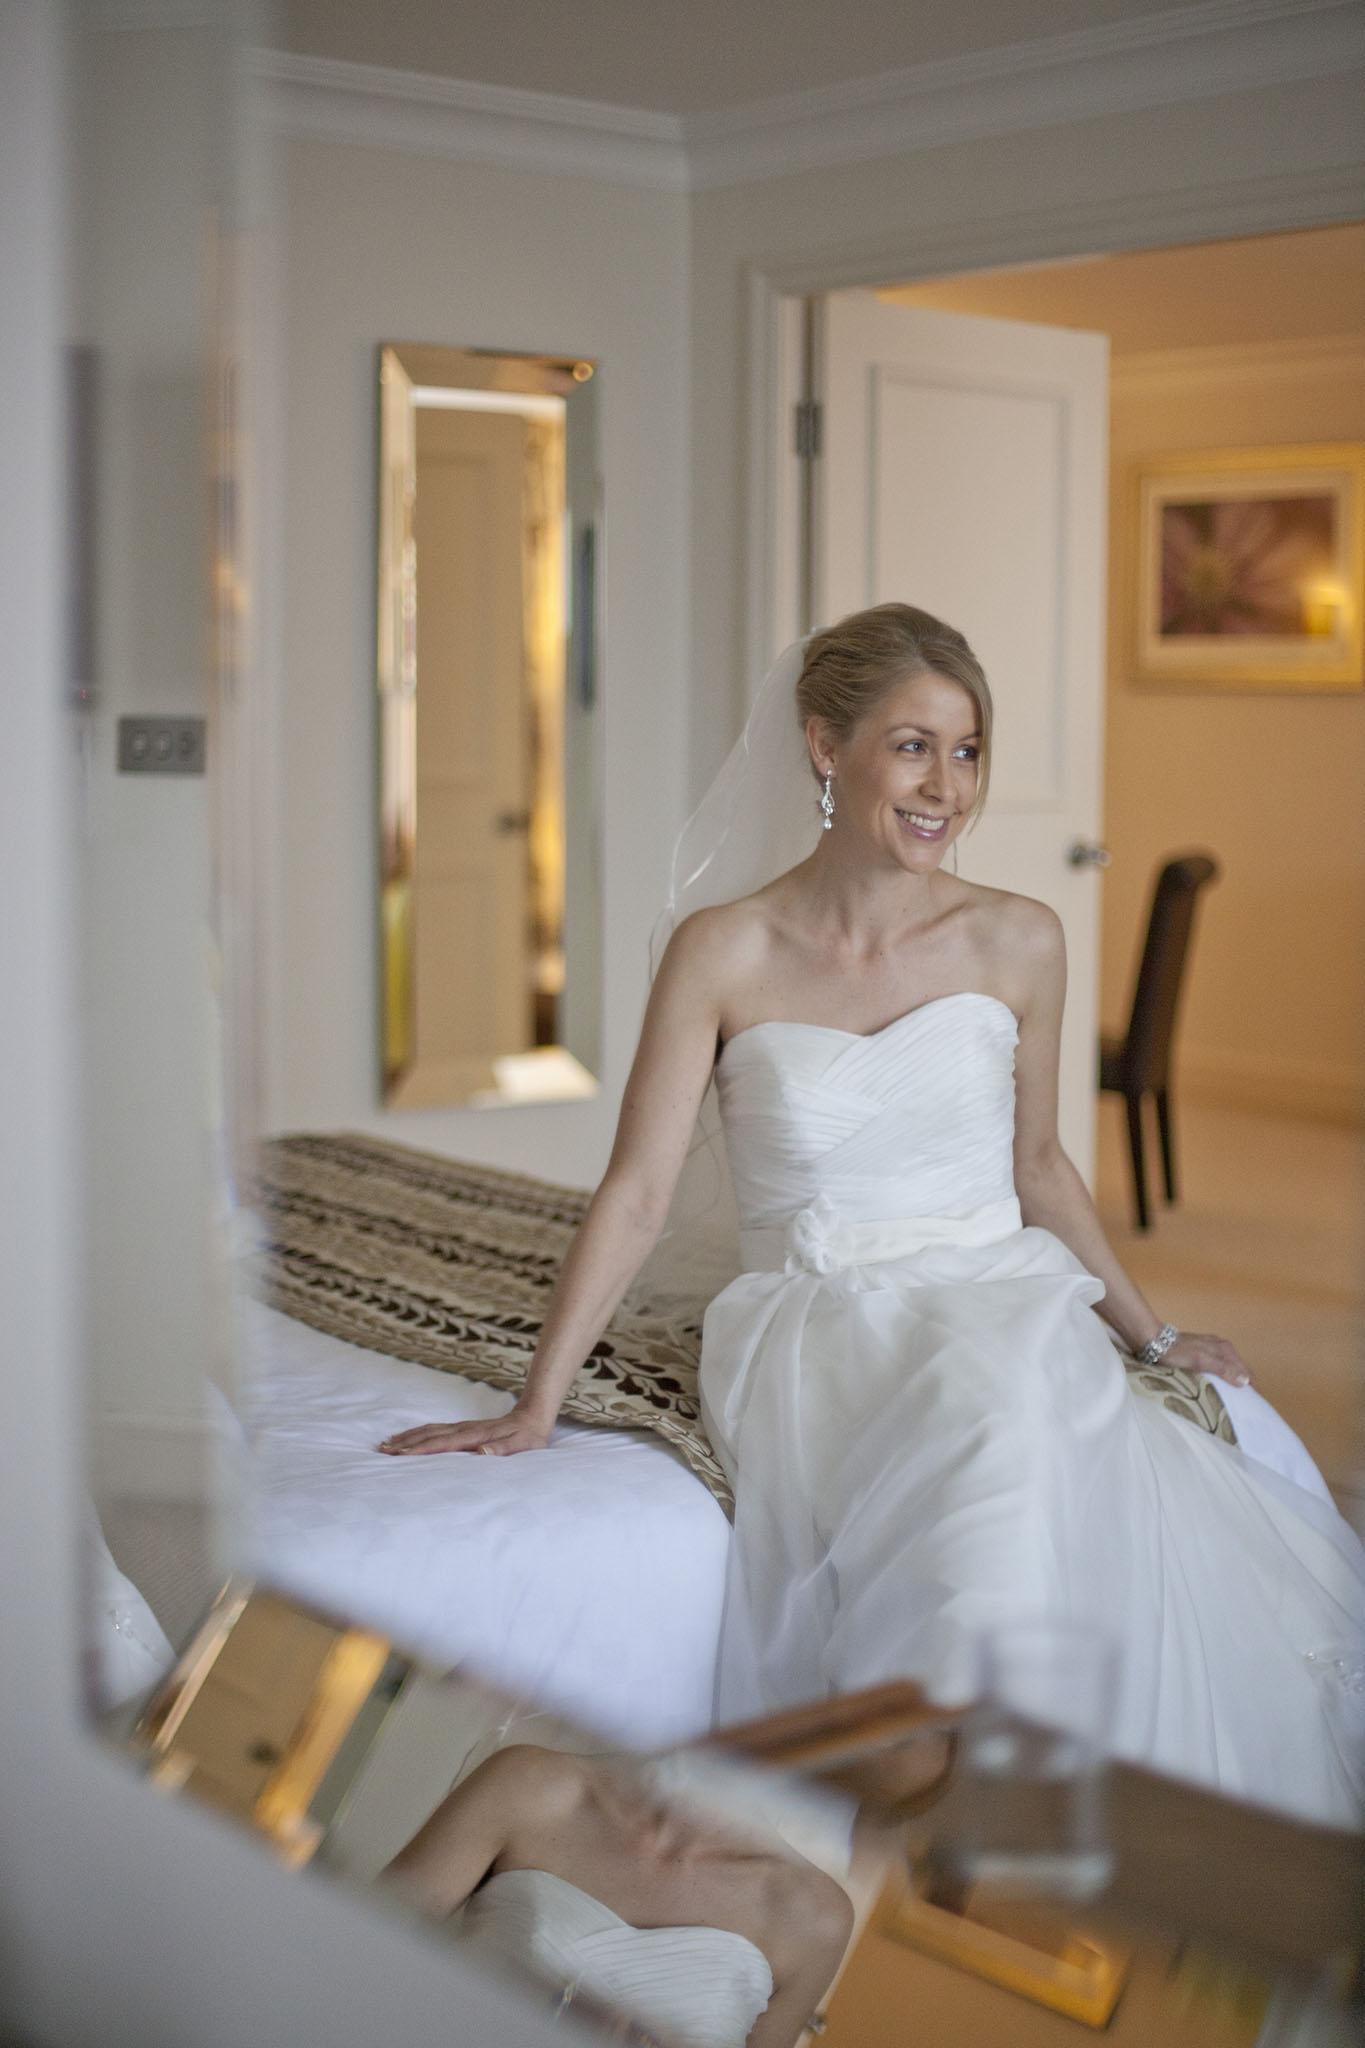 elizabethg_fineart_photography_hertfordshire_rachel_adam_wedding_highelmsmanor_08.jpg